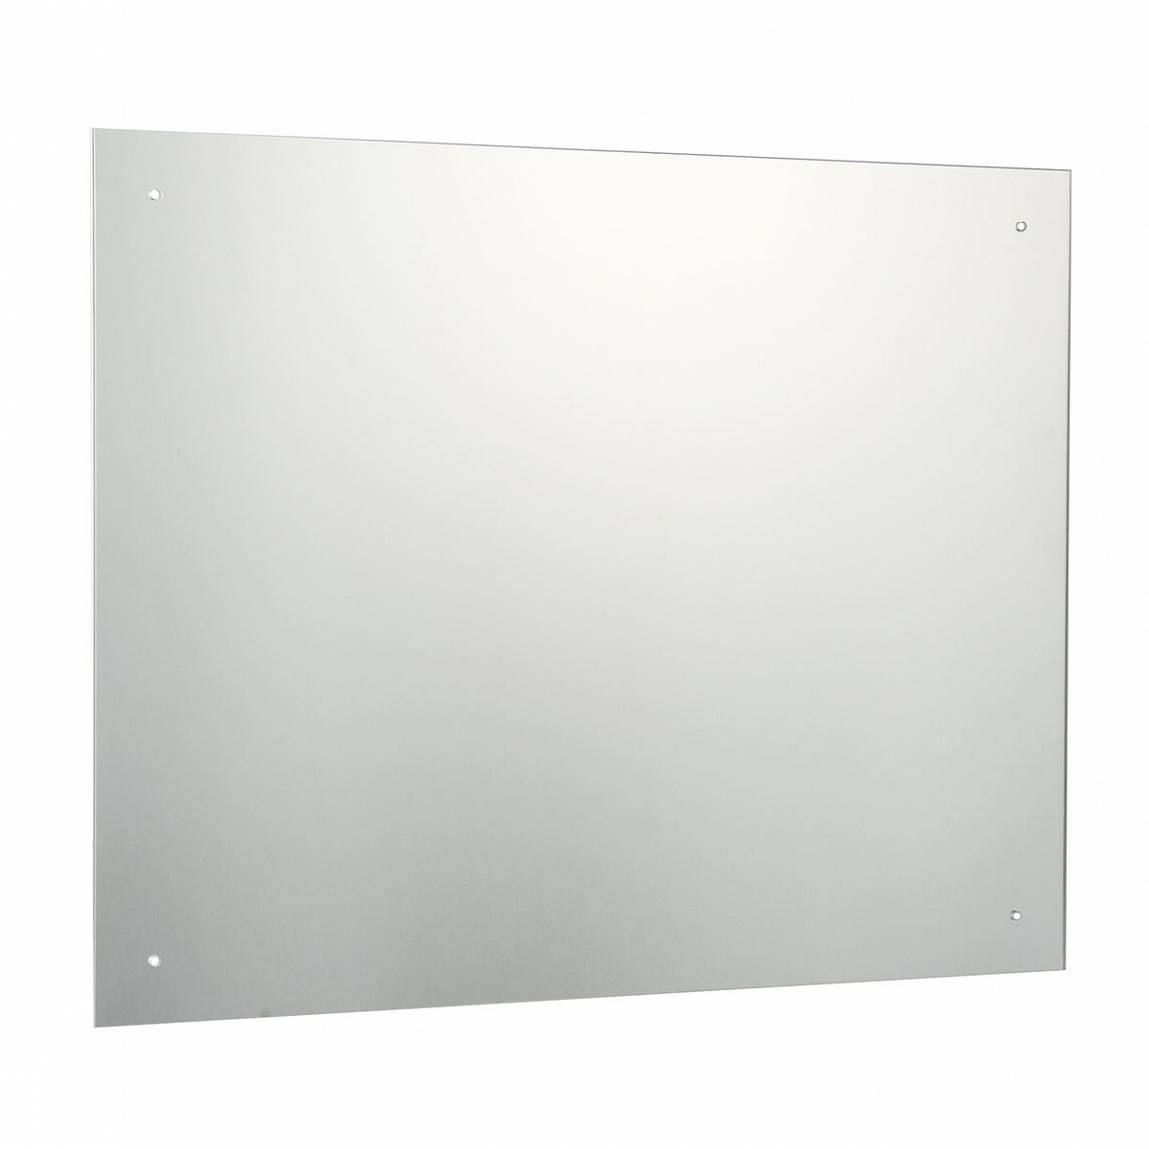 Image of Rectangular Drilled Mirror 50x70cm